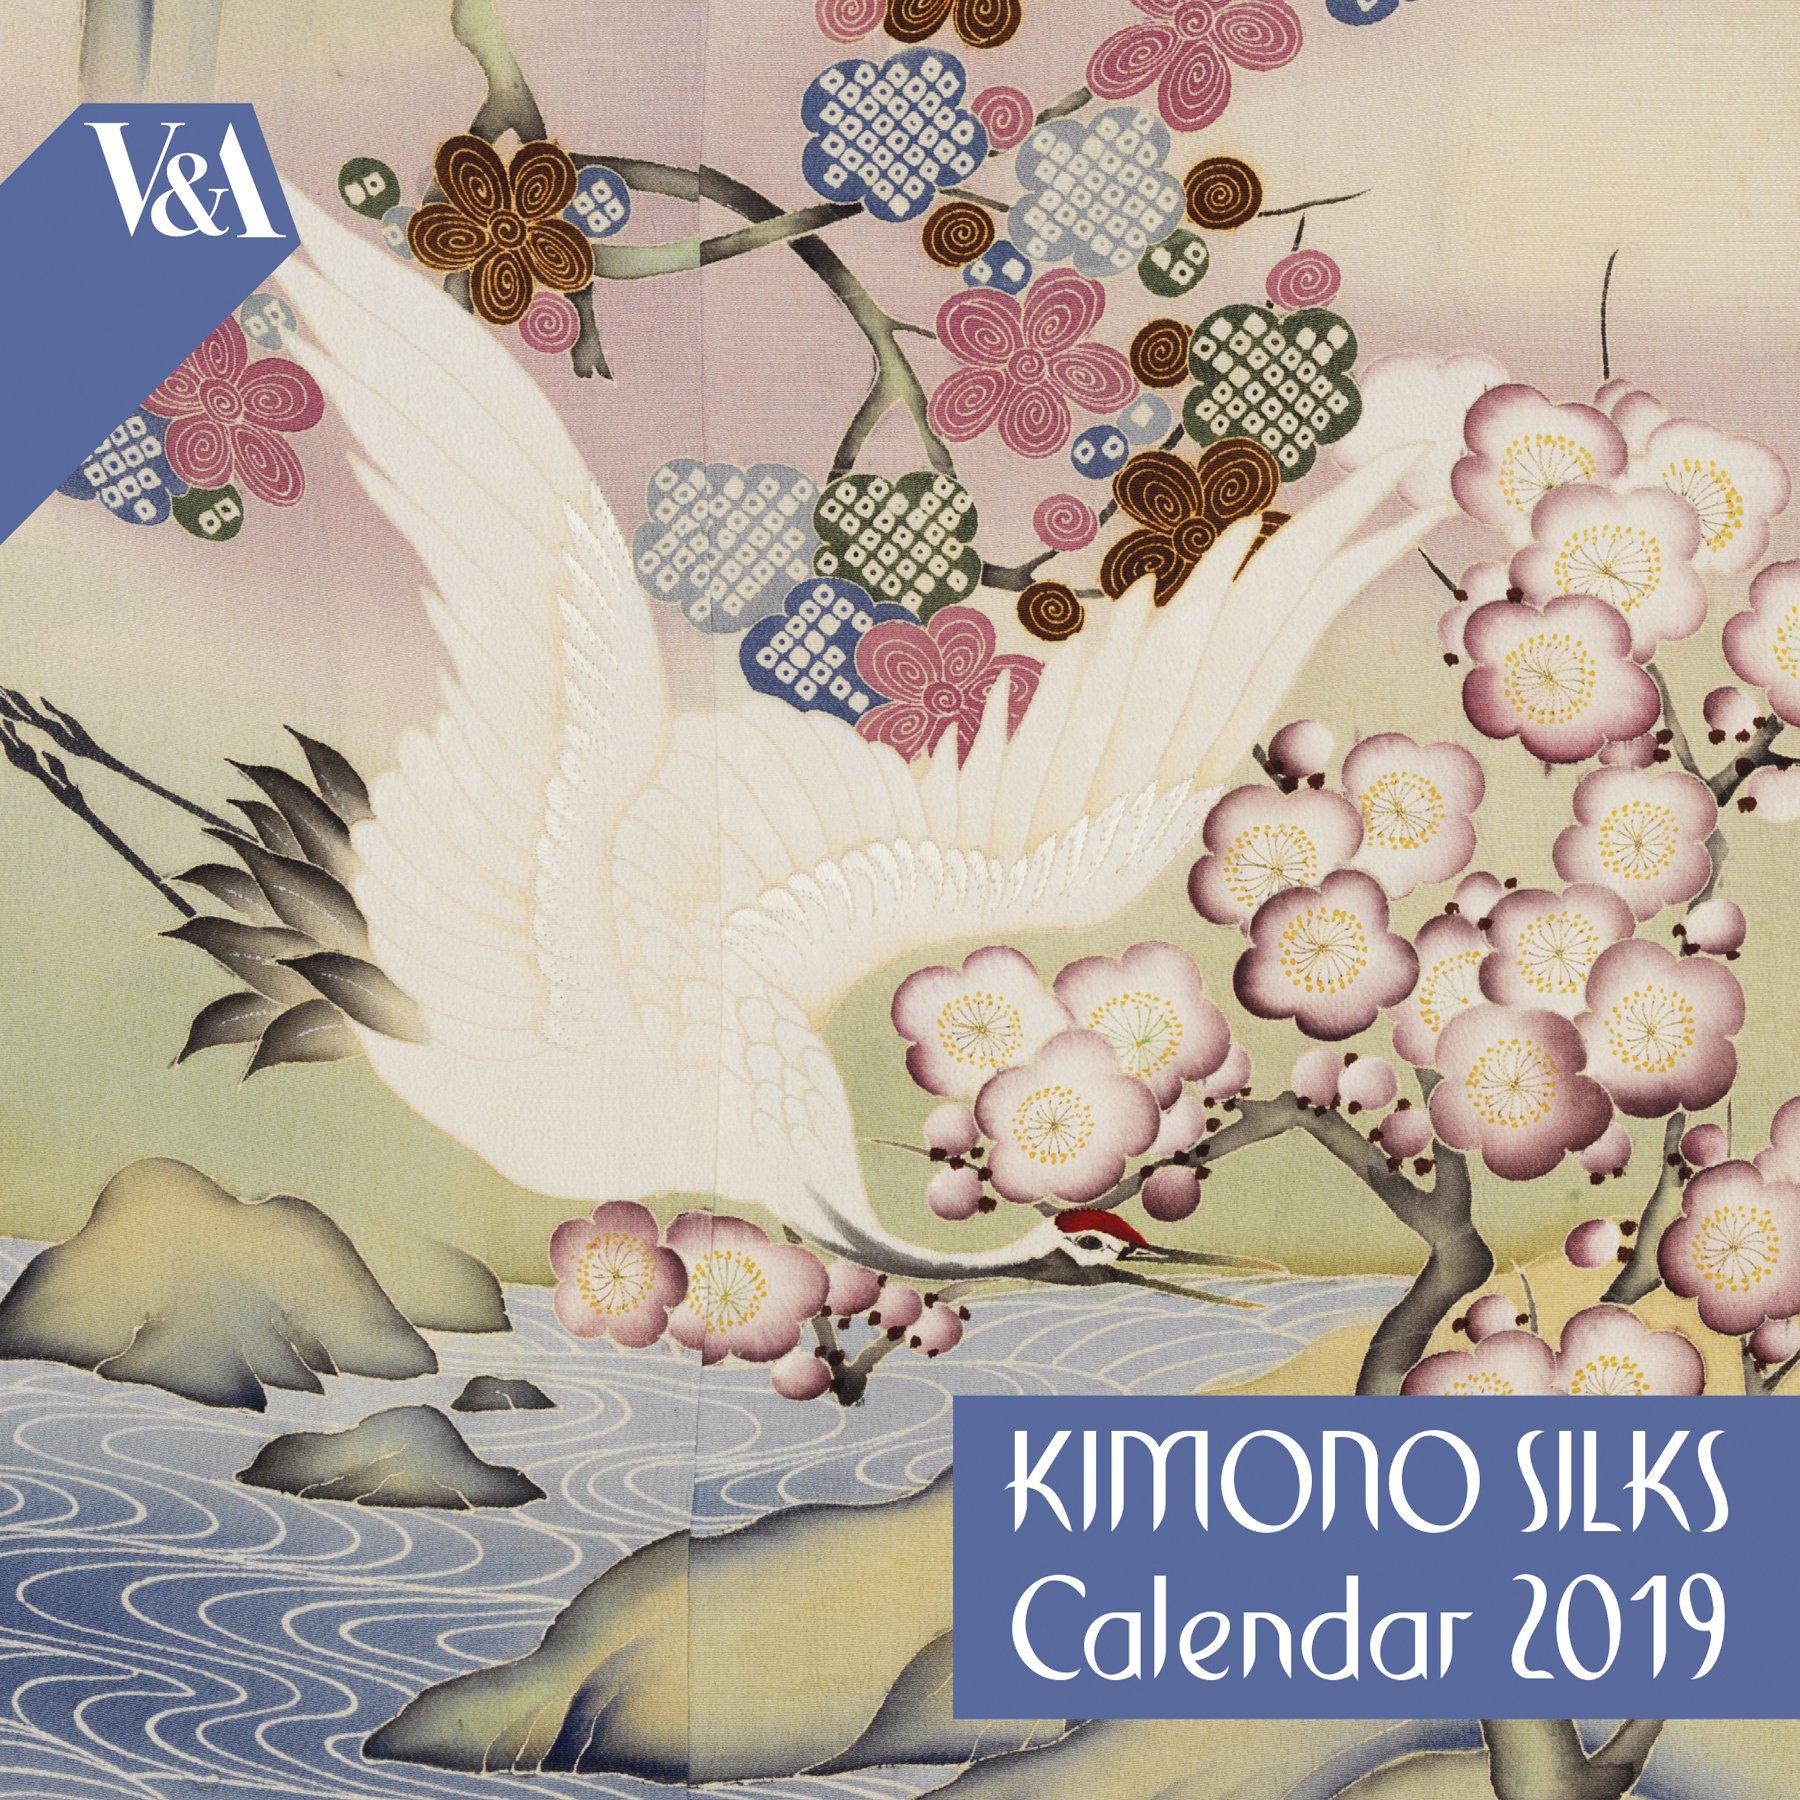 Buy V&a Kimono Silks - Mini Wall Calendar 2019 (Art Calendar) V&a Calendar 2019